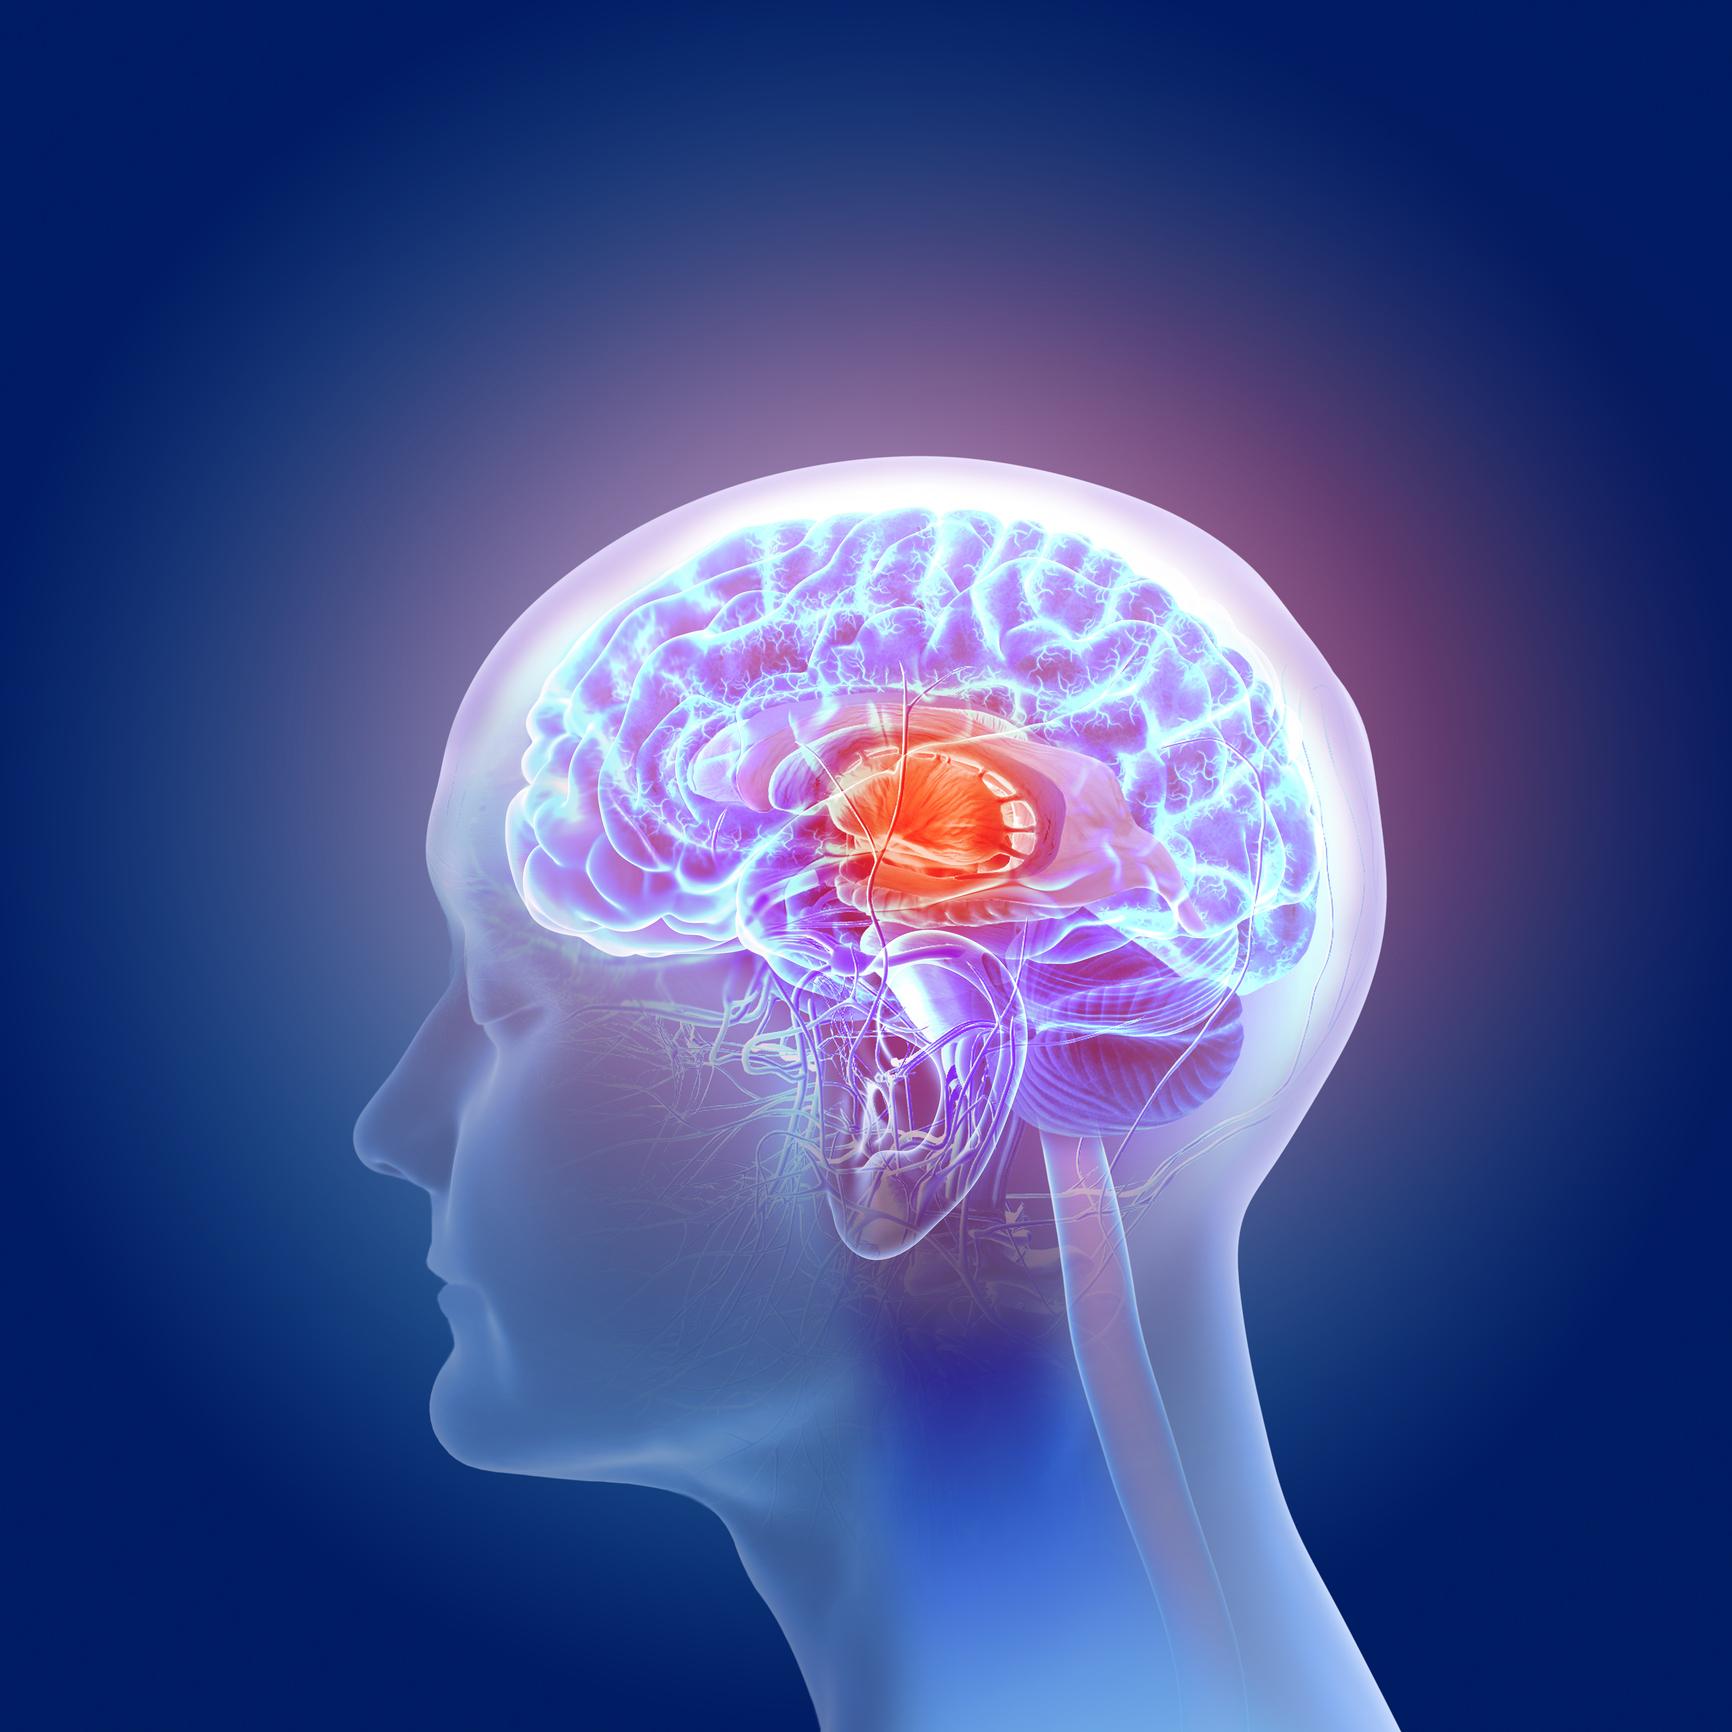 3d illustration of the human brain anatomy